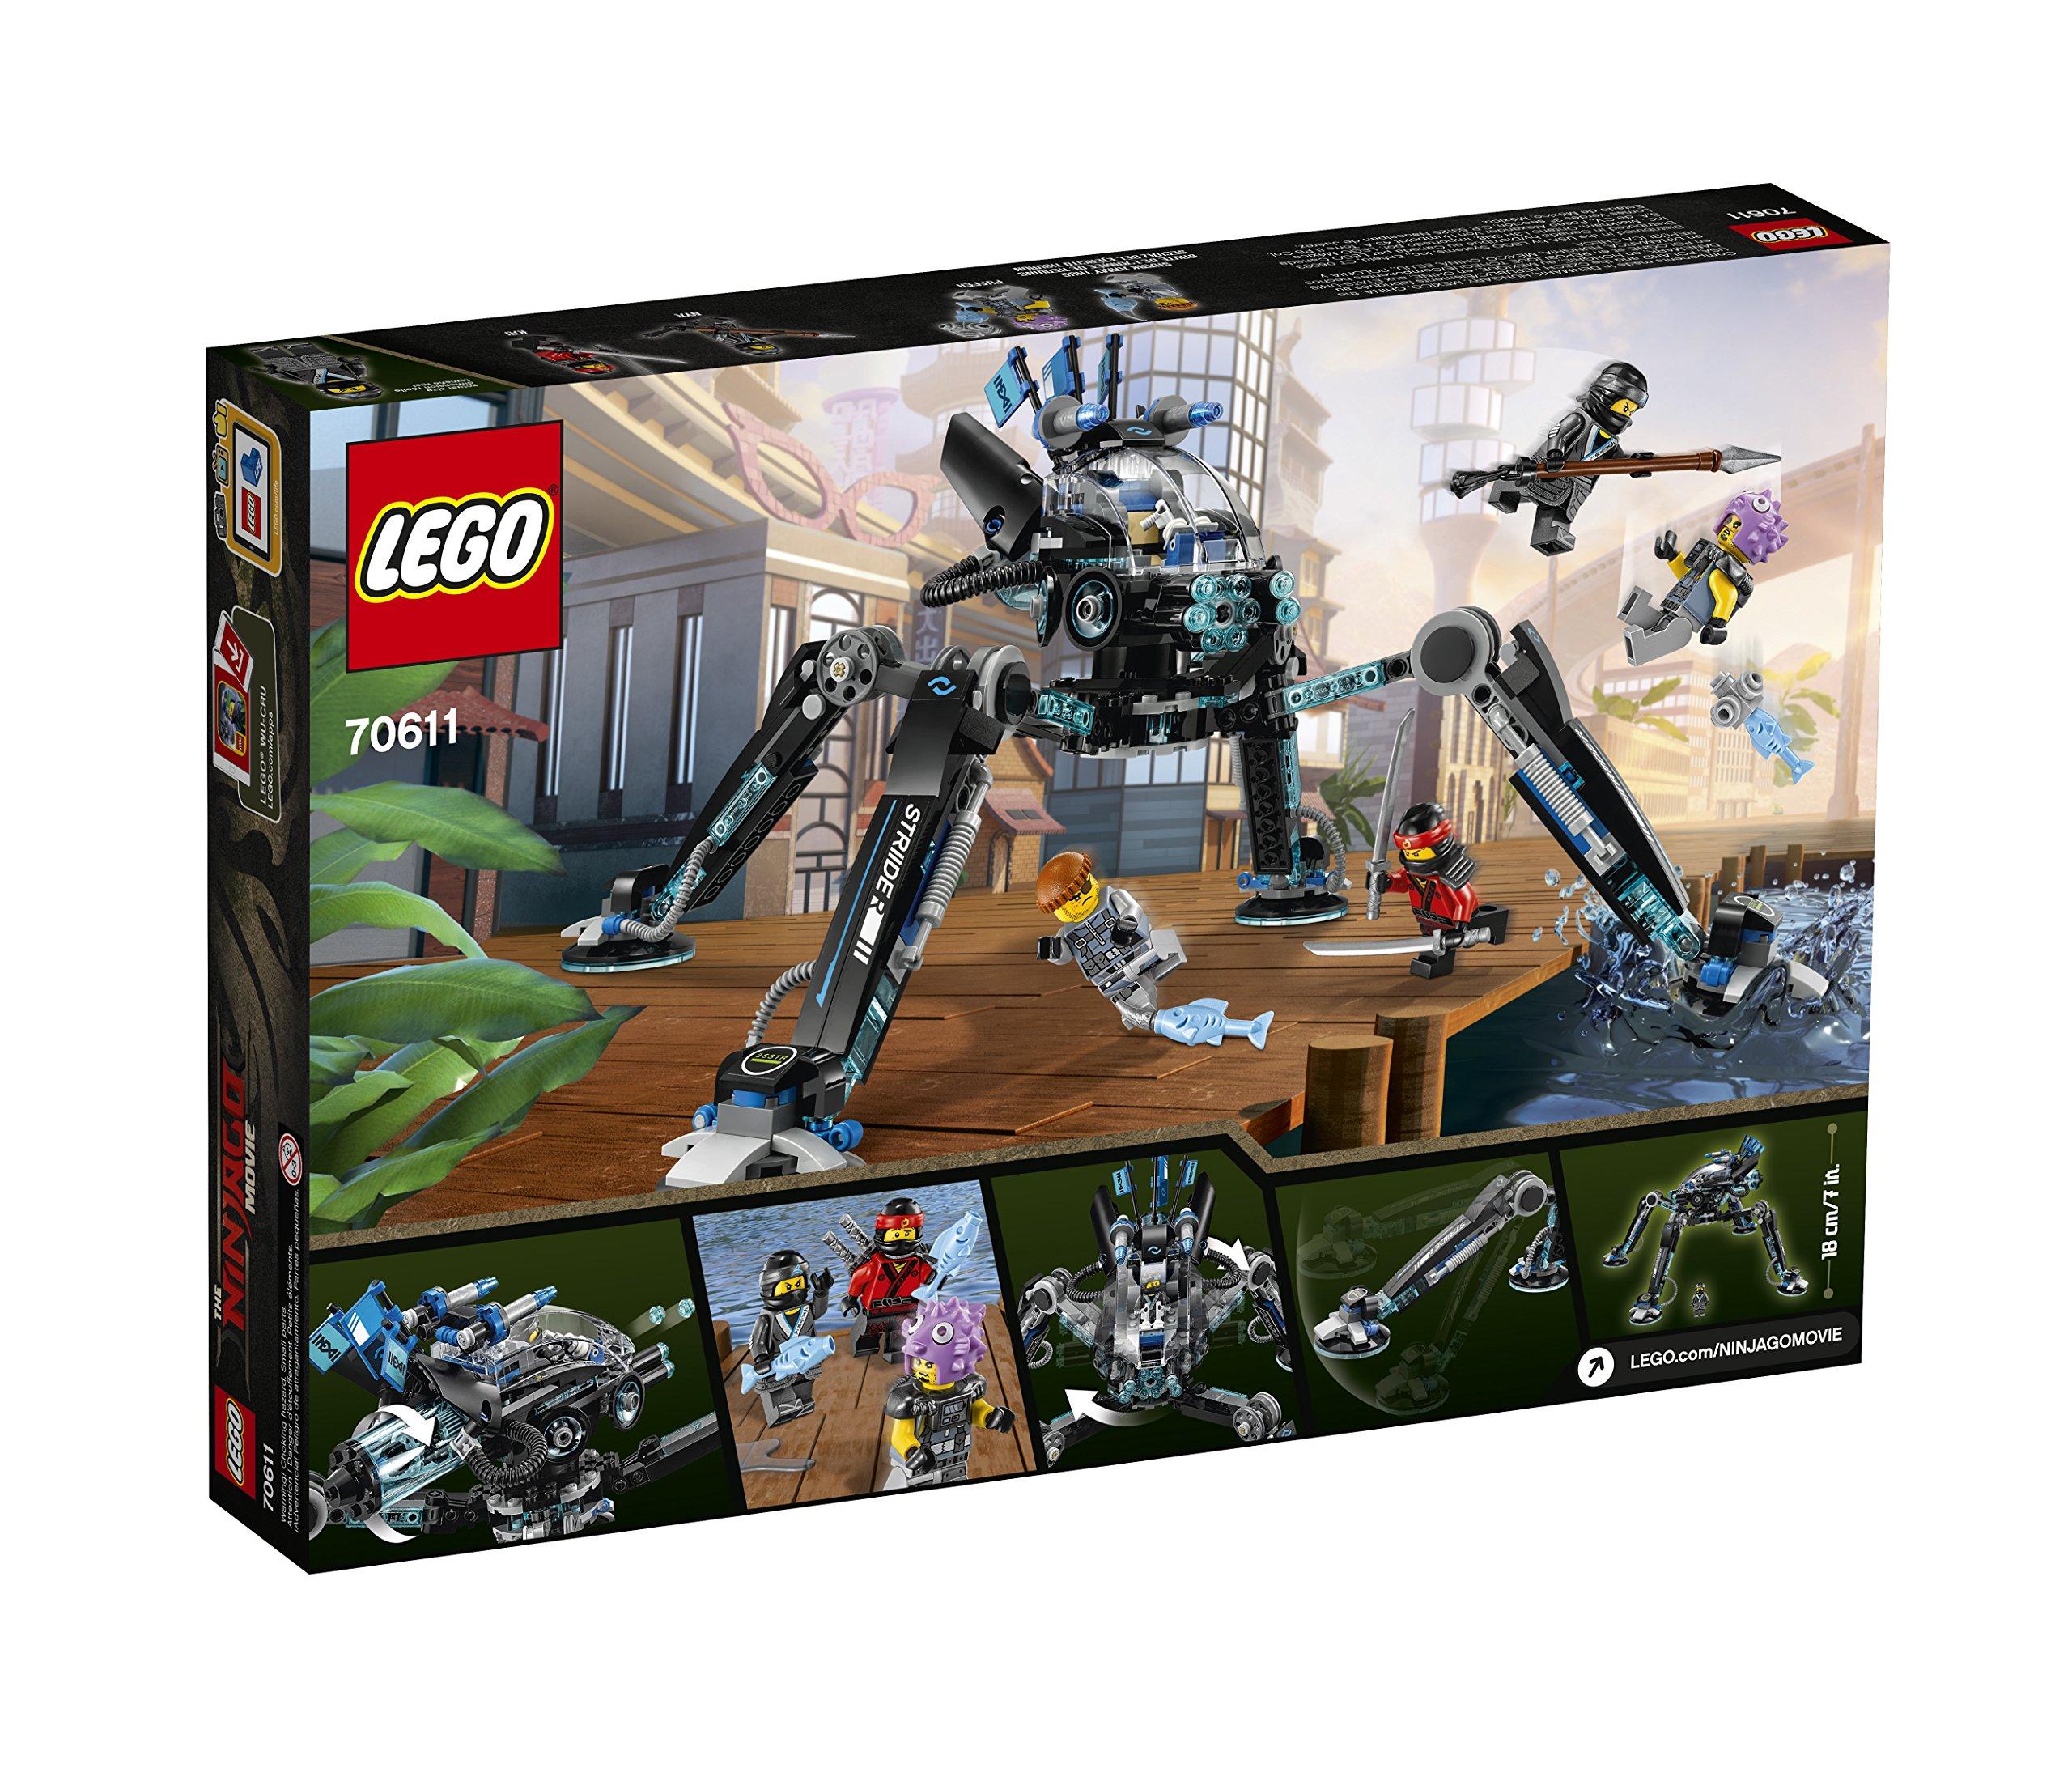 Lego for boys 6 12 lego ninjago water strider 70611 building kit 494 piece 691023576858 ebay - Lego ninjago 6 ...